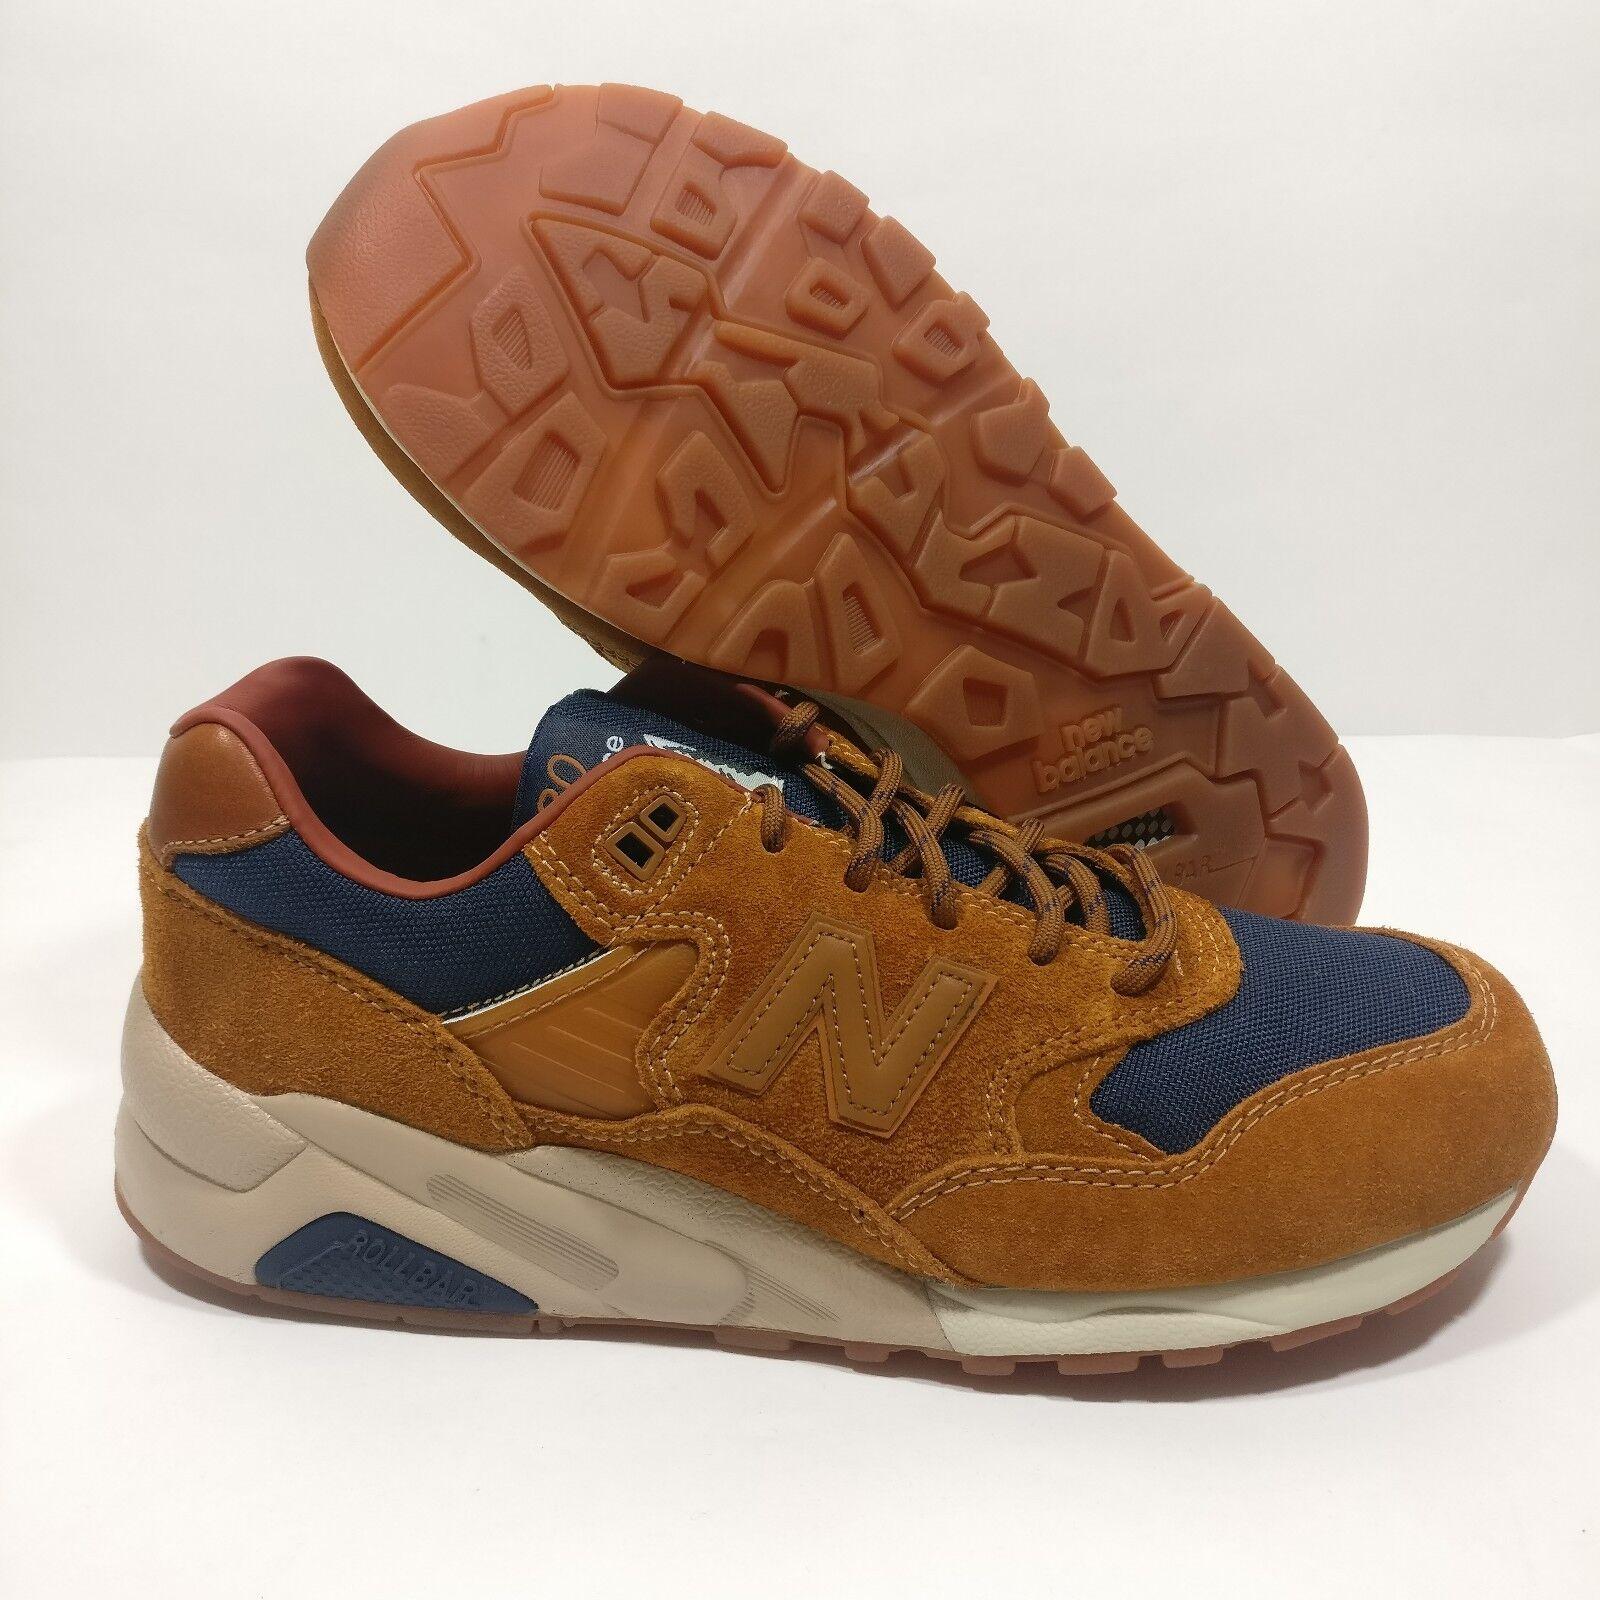 Mens New Balance 580 Cordura Brown Blue Running MT580SB Winter Shoe Size 9.5